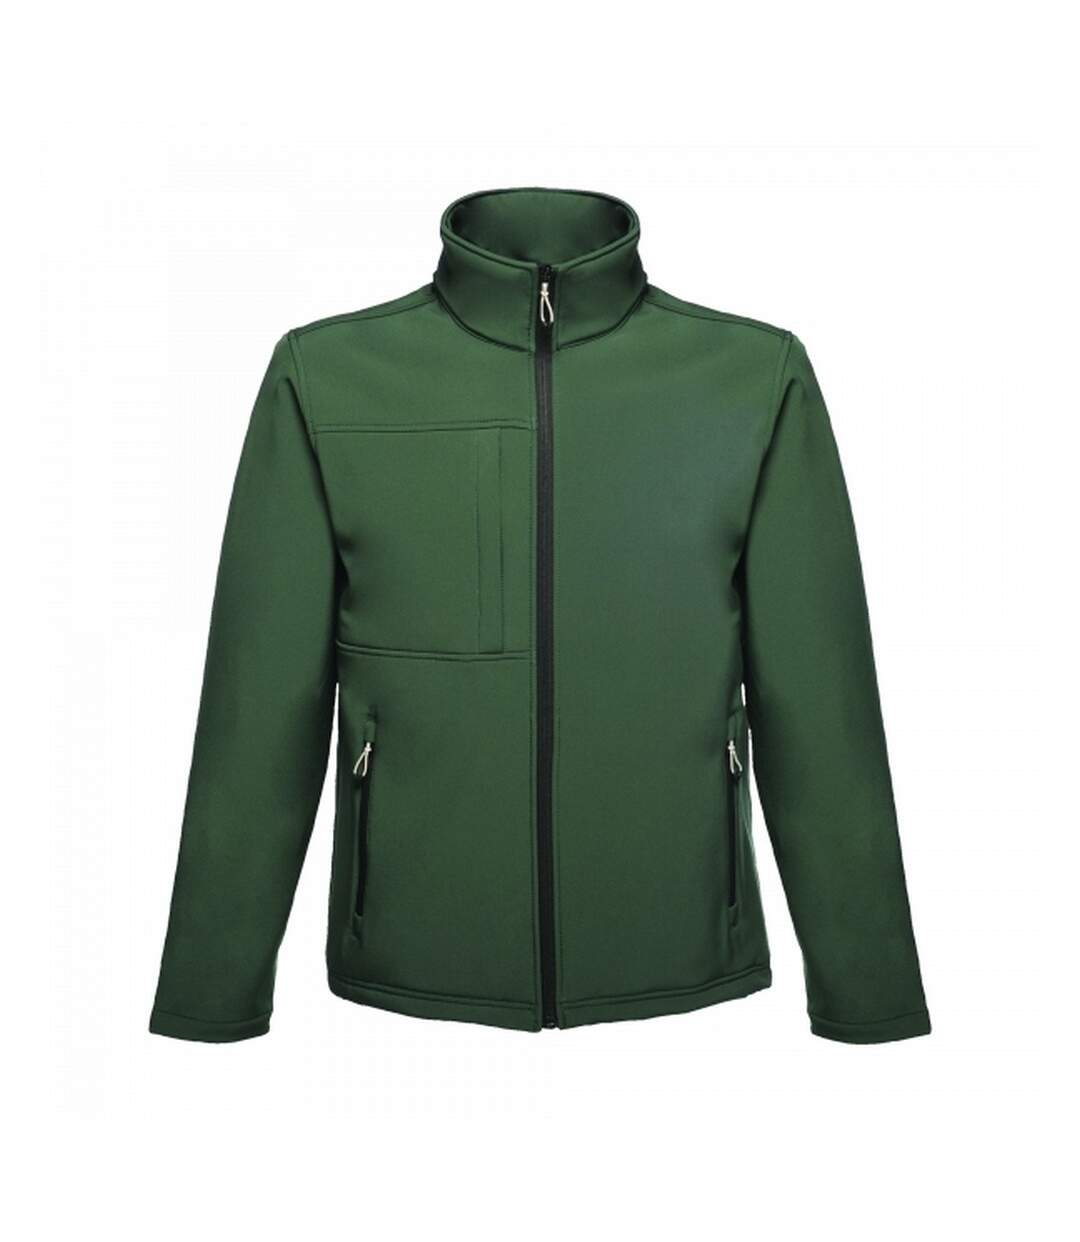 Regatta Professional Mens Octagon II Waterproof Softshell Jacket (Classic Red/Black) - UTRG2164